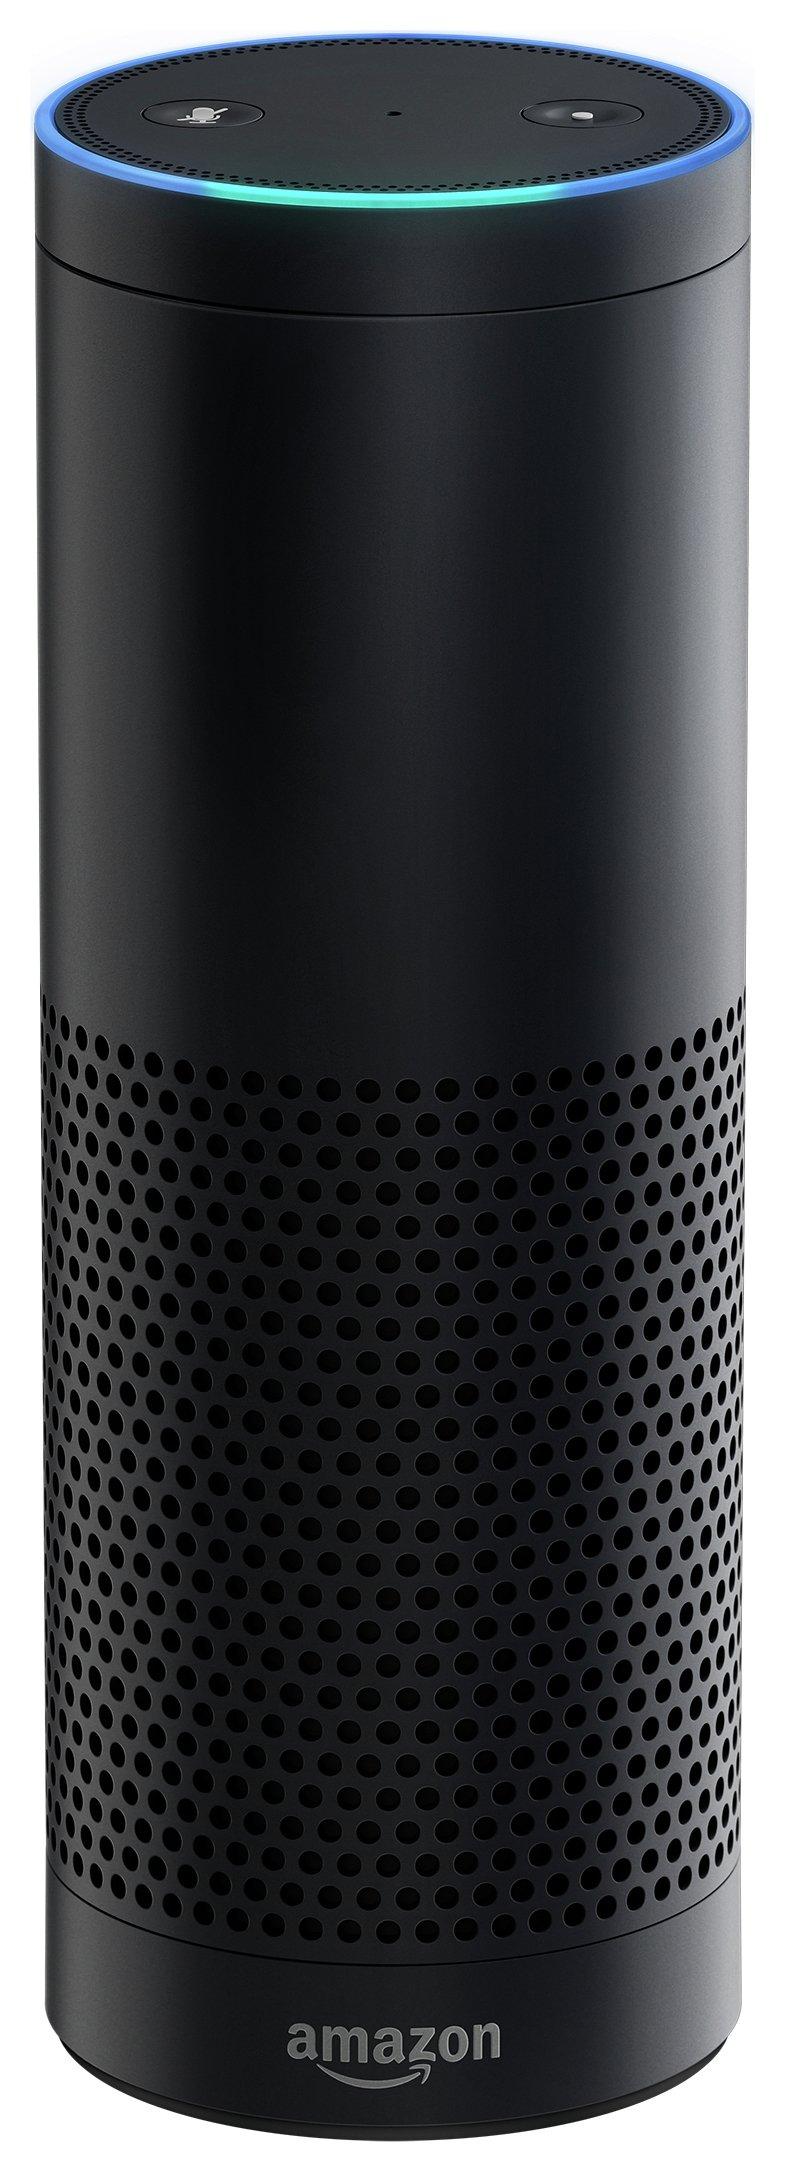 Amazon Echo Multimedia Speaker with Voice Control - Black.